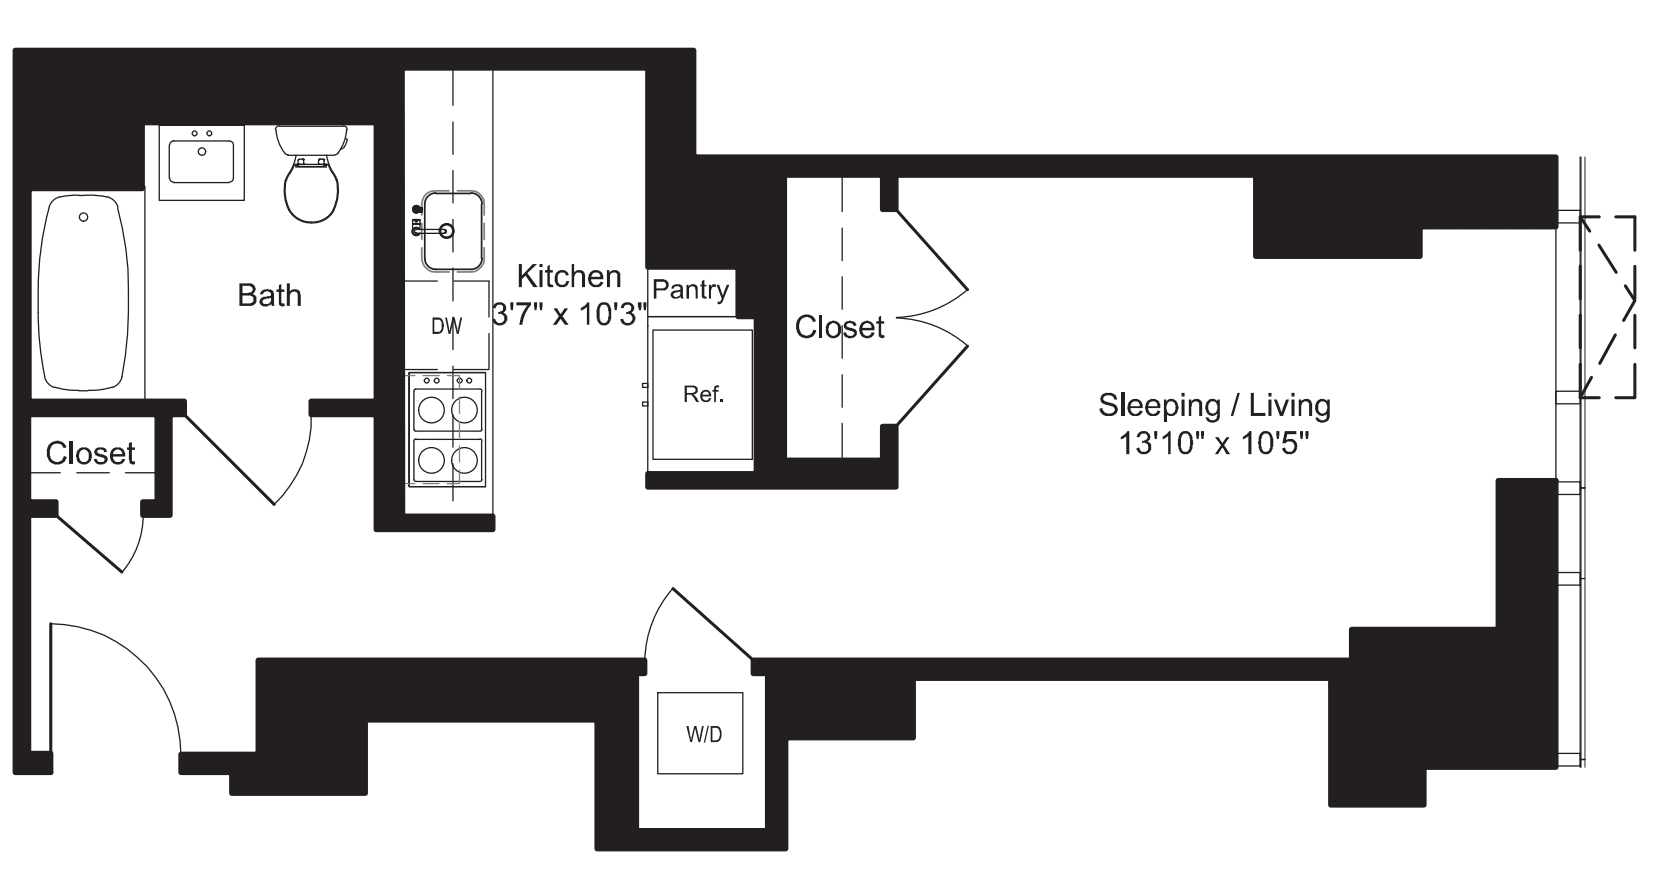 Studio G 2-6